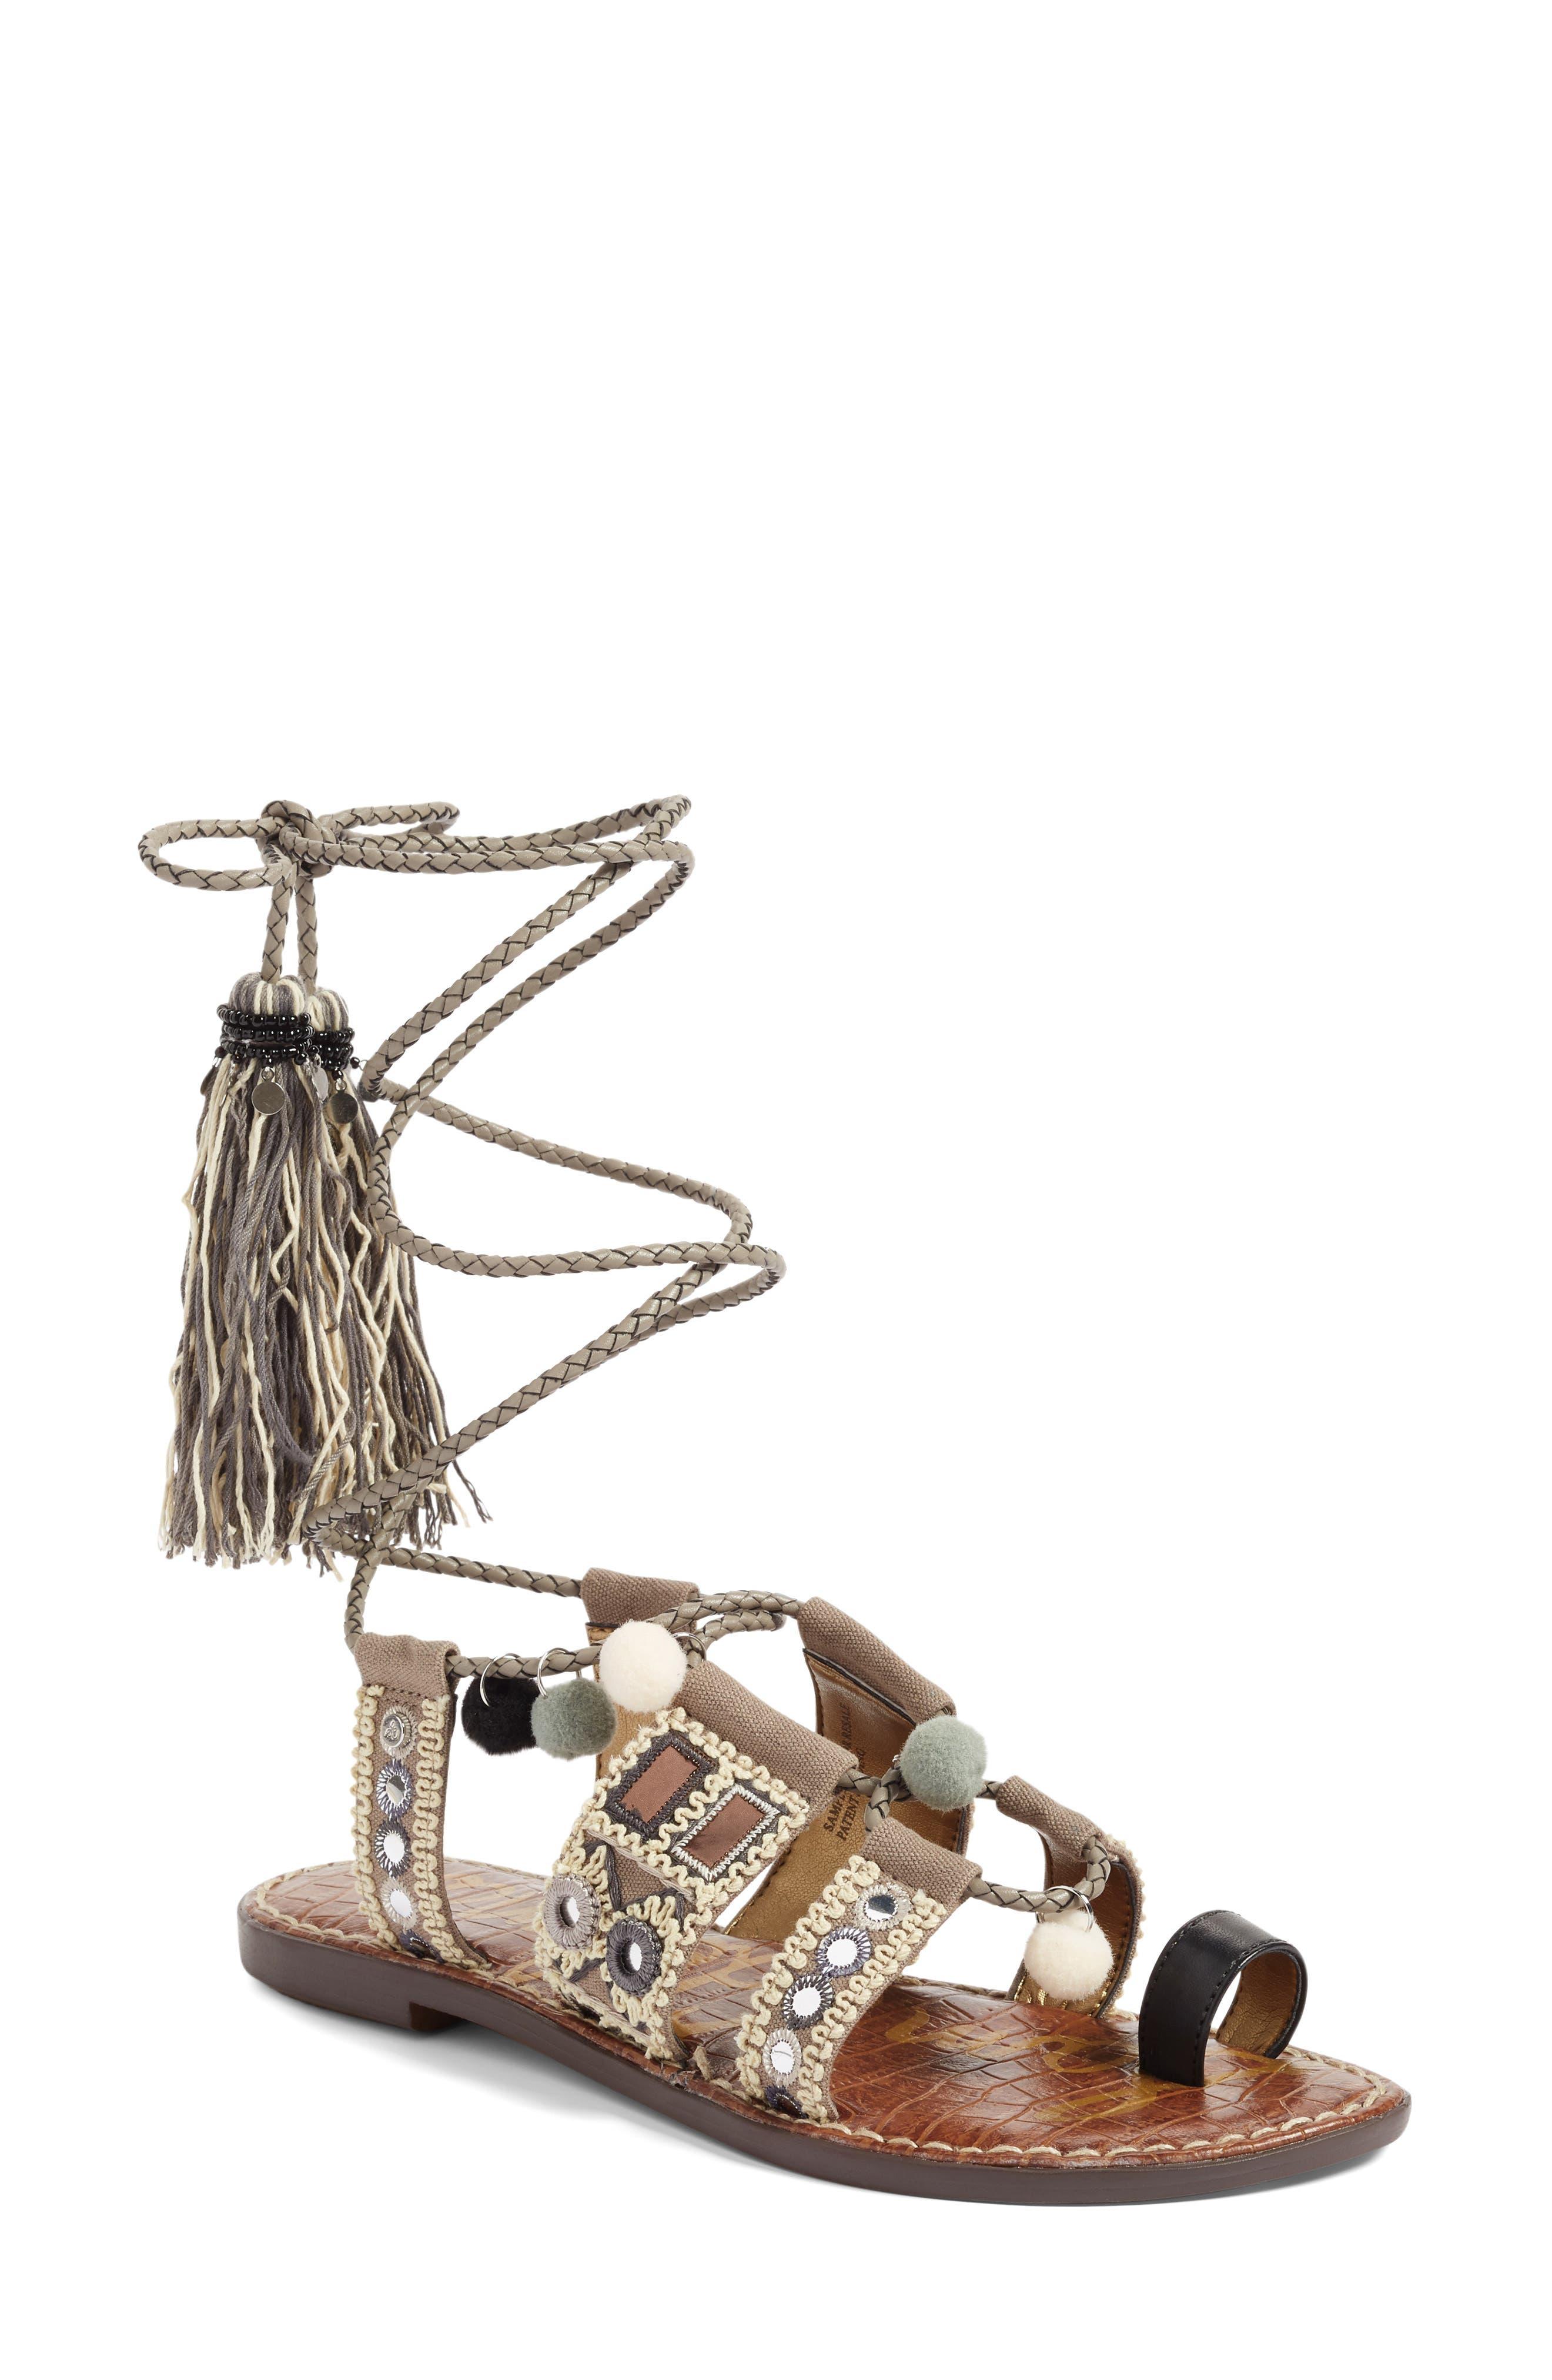 Gretchen Gladiator Sandal,                             Main thumbnail 1, color,                             020